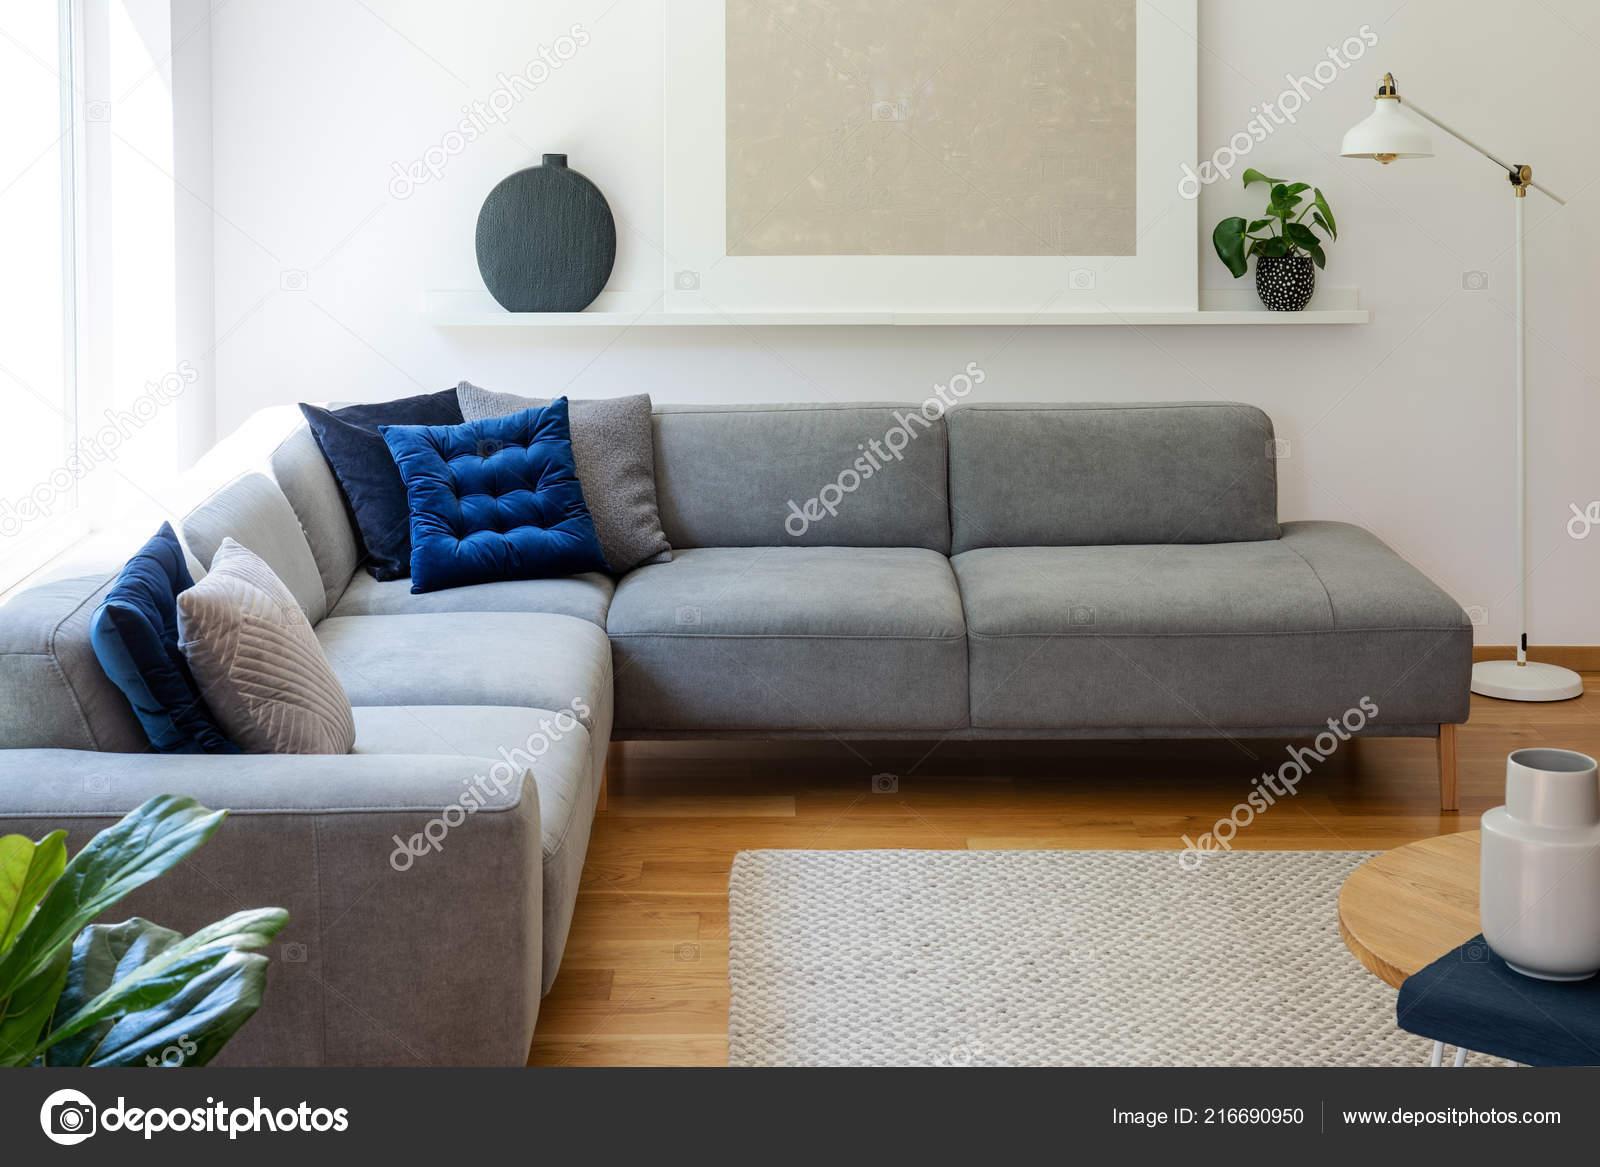 Blue Pillows Grey Corner Sofa Apartment Interior Lamp Plant Next — Stock Photo © Photographee.eu #216690950